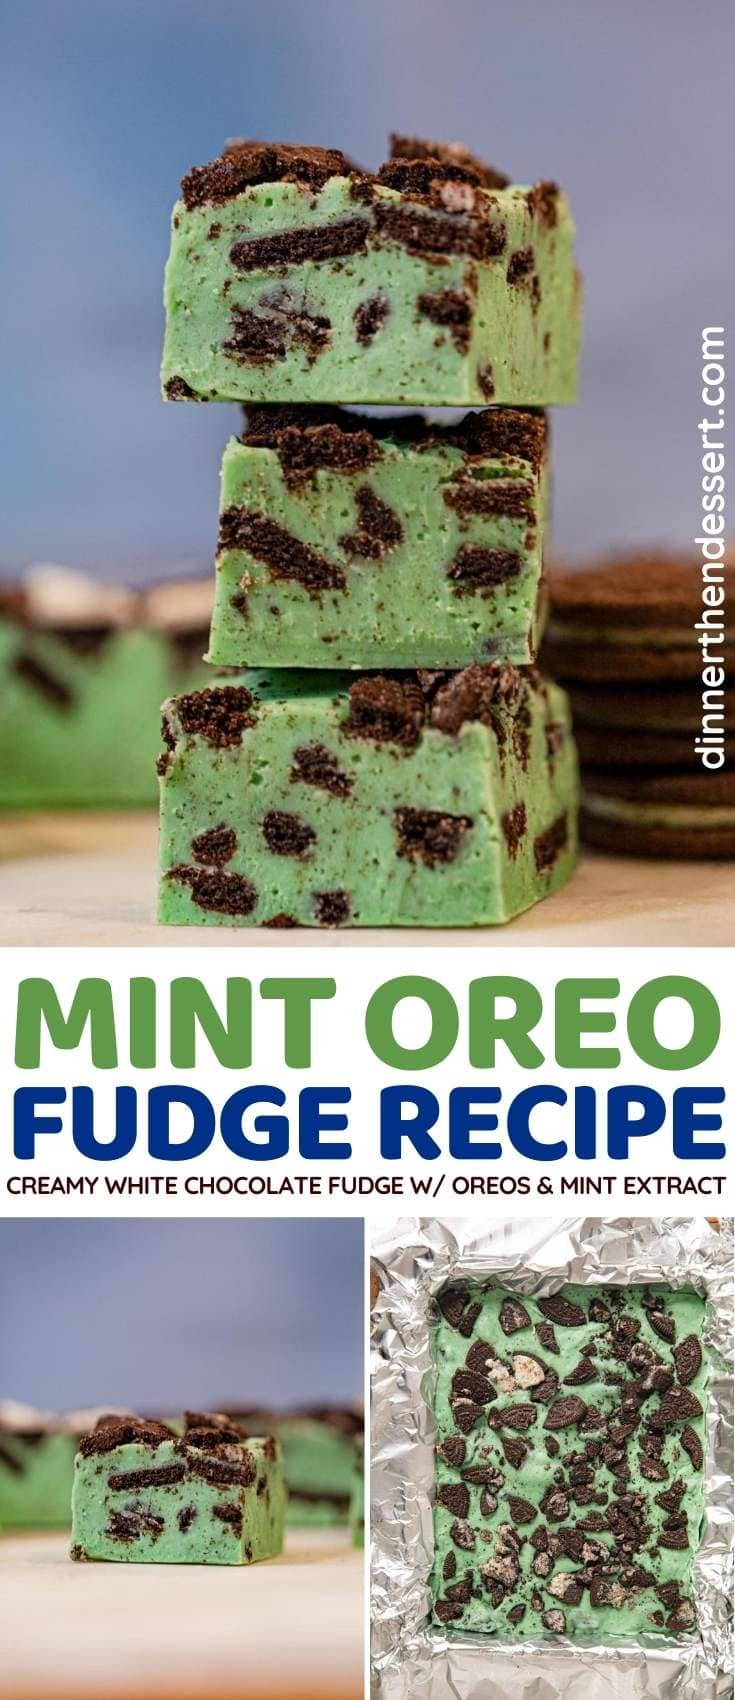 Mint Oreo Fudge collage